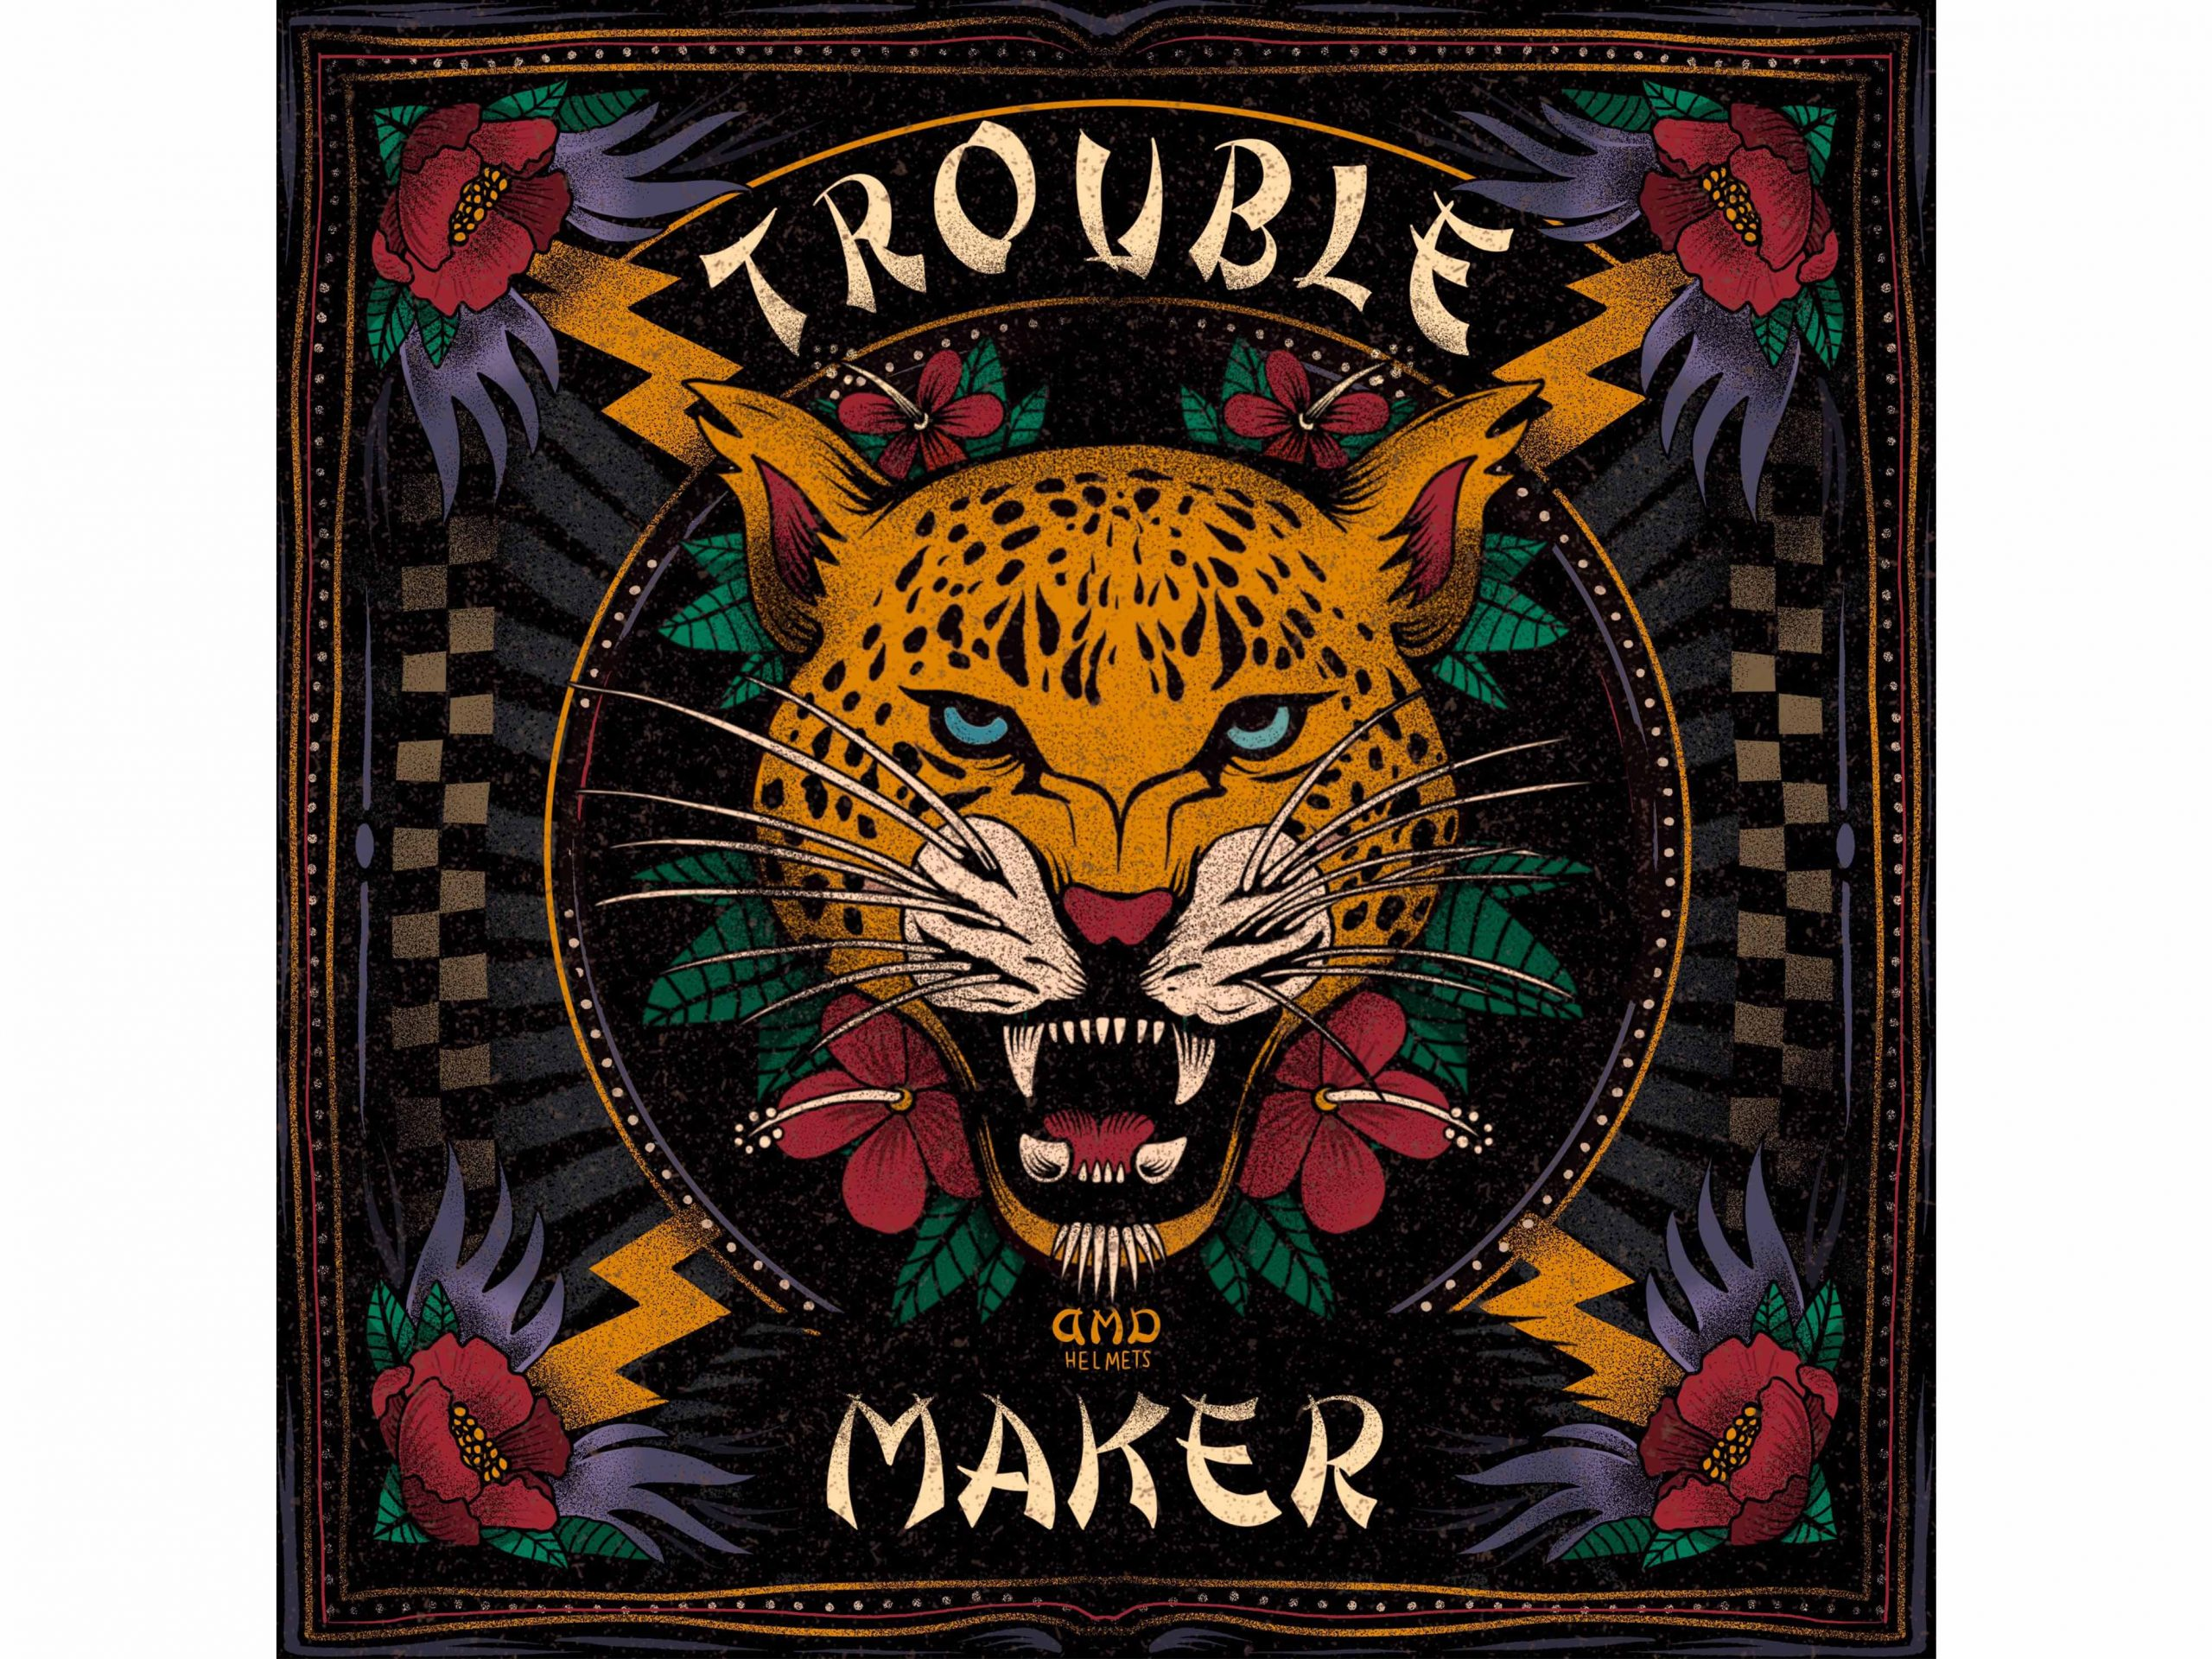 Foulard vintage seta e cotone DMD Trouble Maker 2